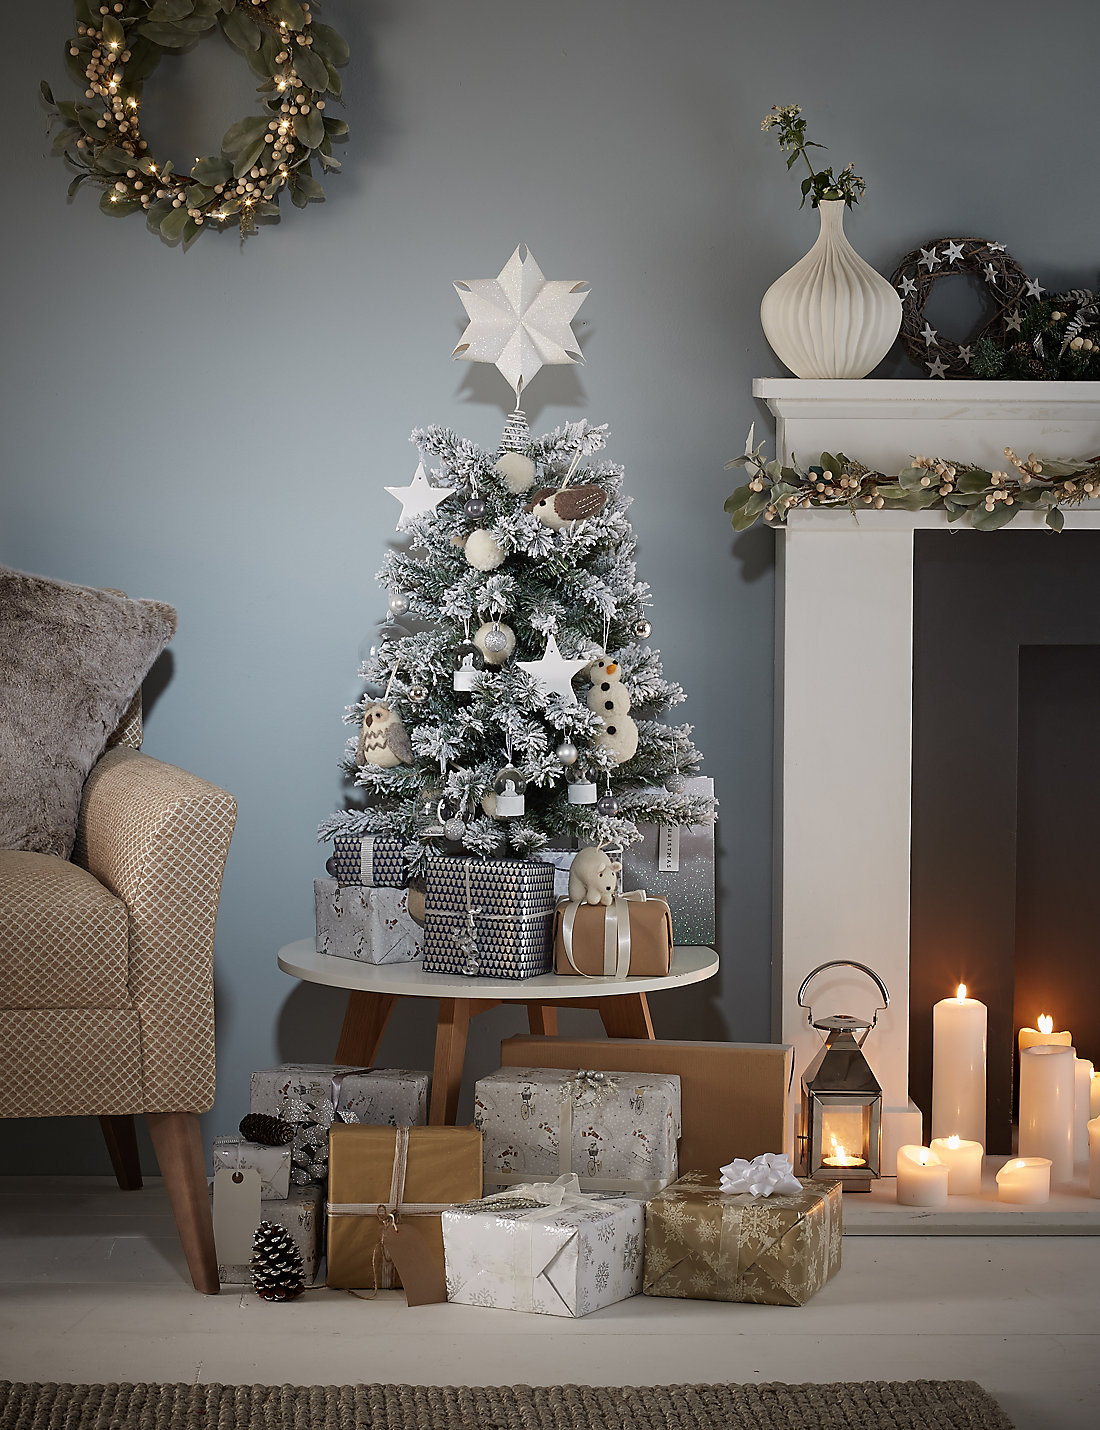 3 ft decorated christmas tree decoration image idea - 3 Ft Christmas Tree